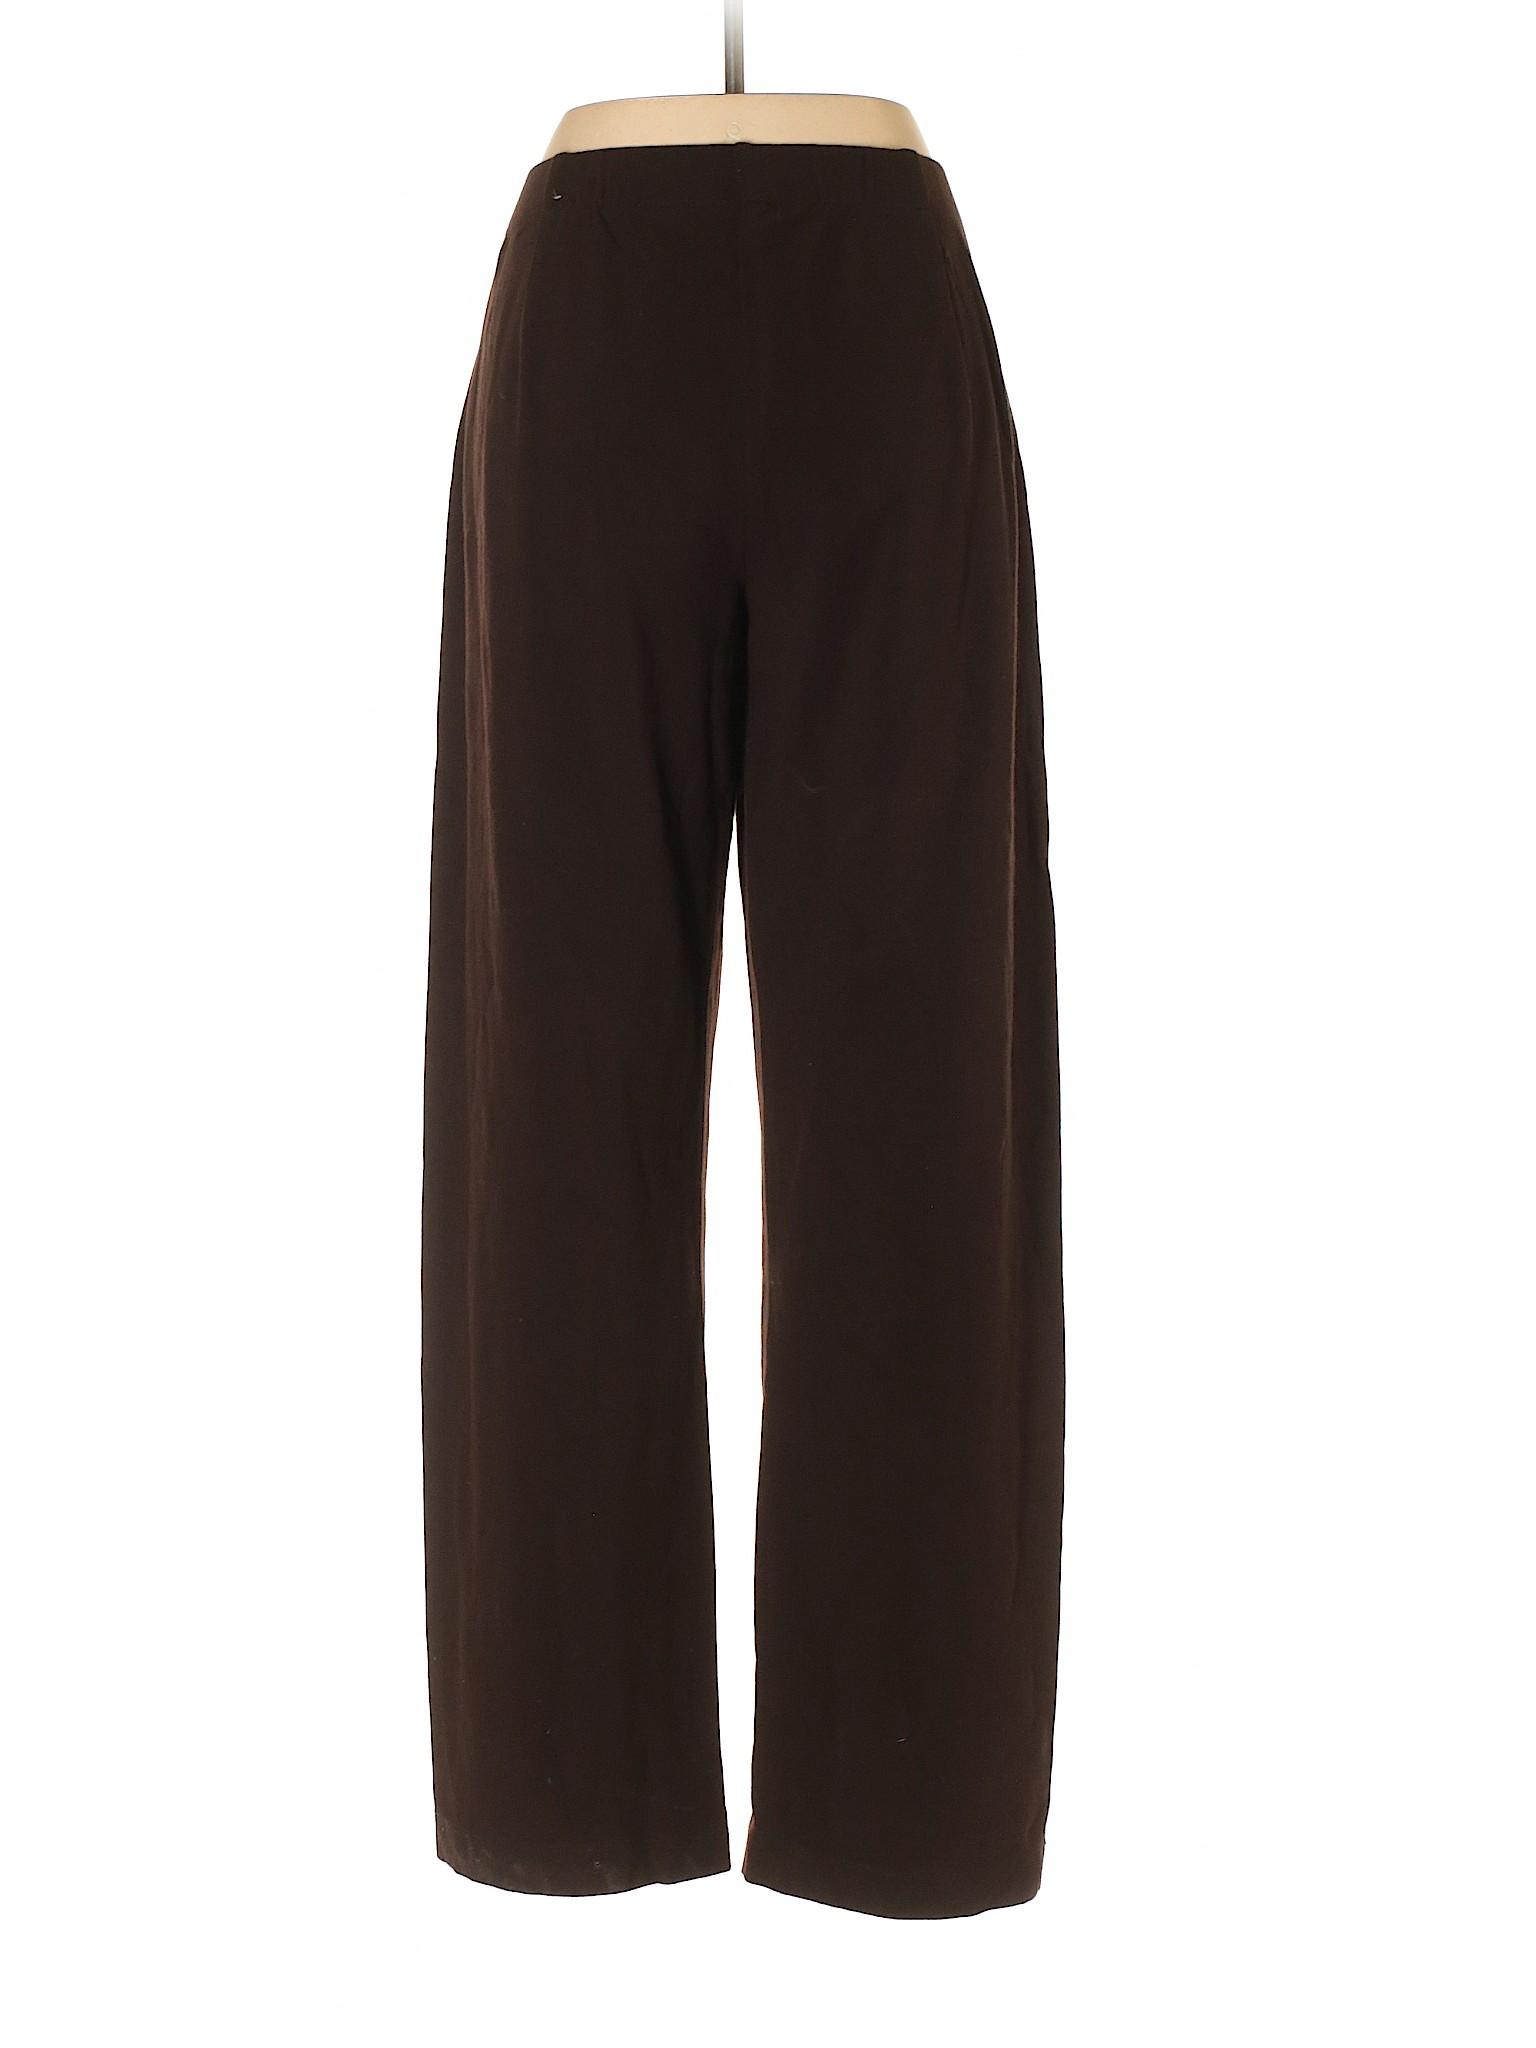 Boutique Chico's Boutique Casual Pants Casual Pants Chico's Chico's Casual Boutique Pants 0naqx886wU